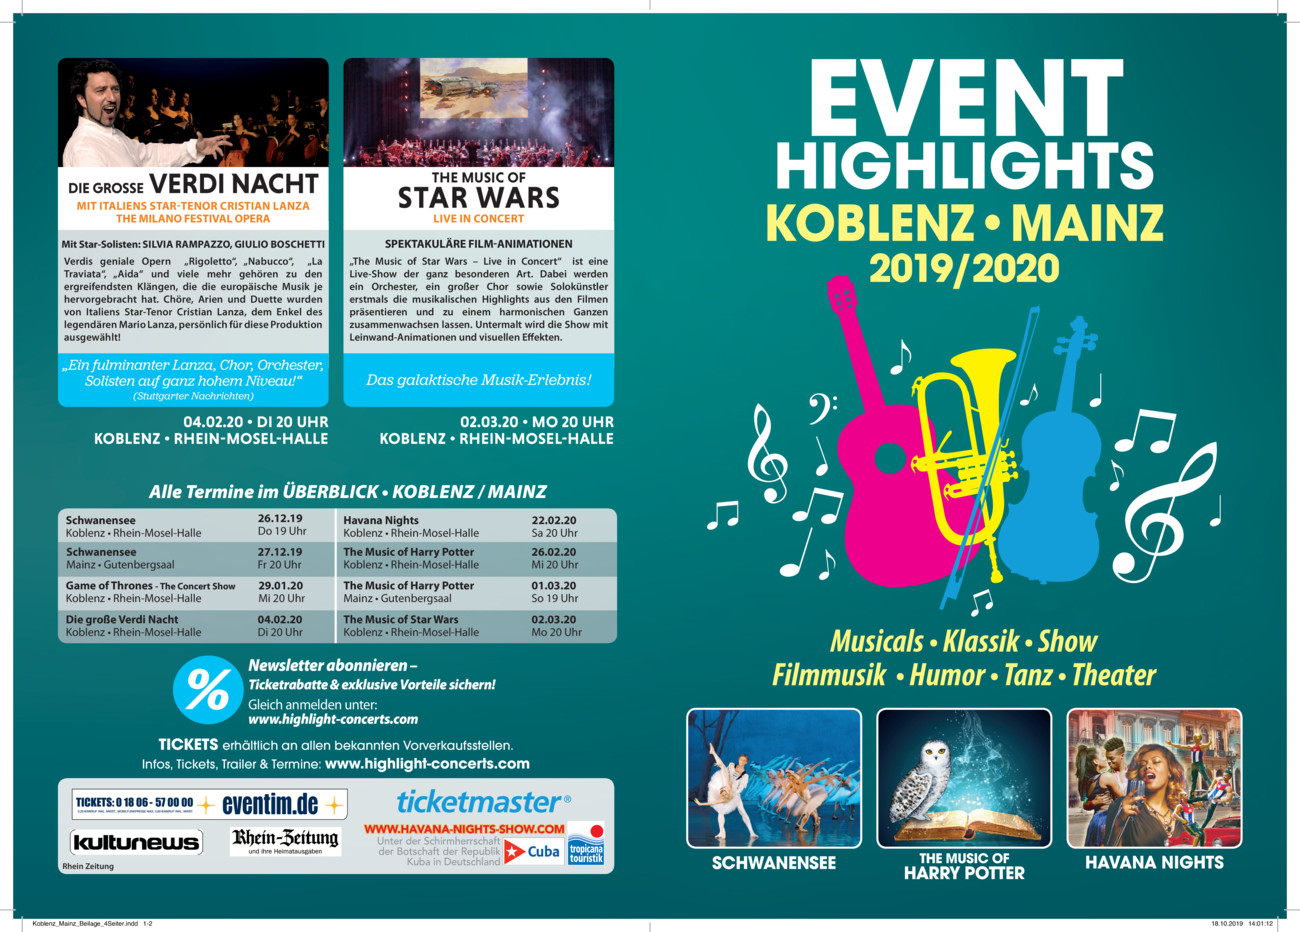 EVENT HIGHLIGHTS 2019/2020